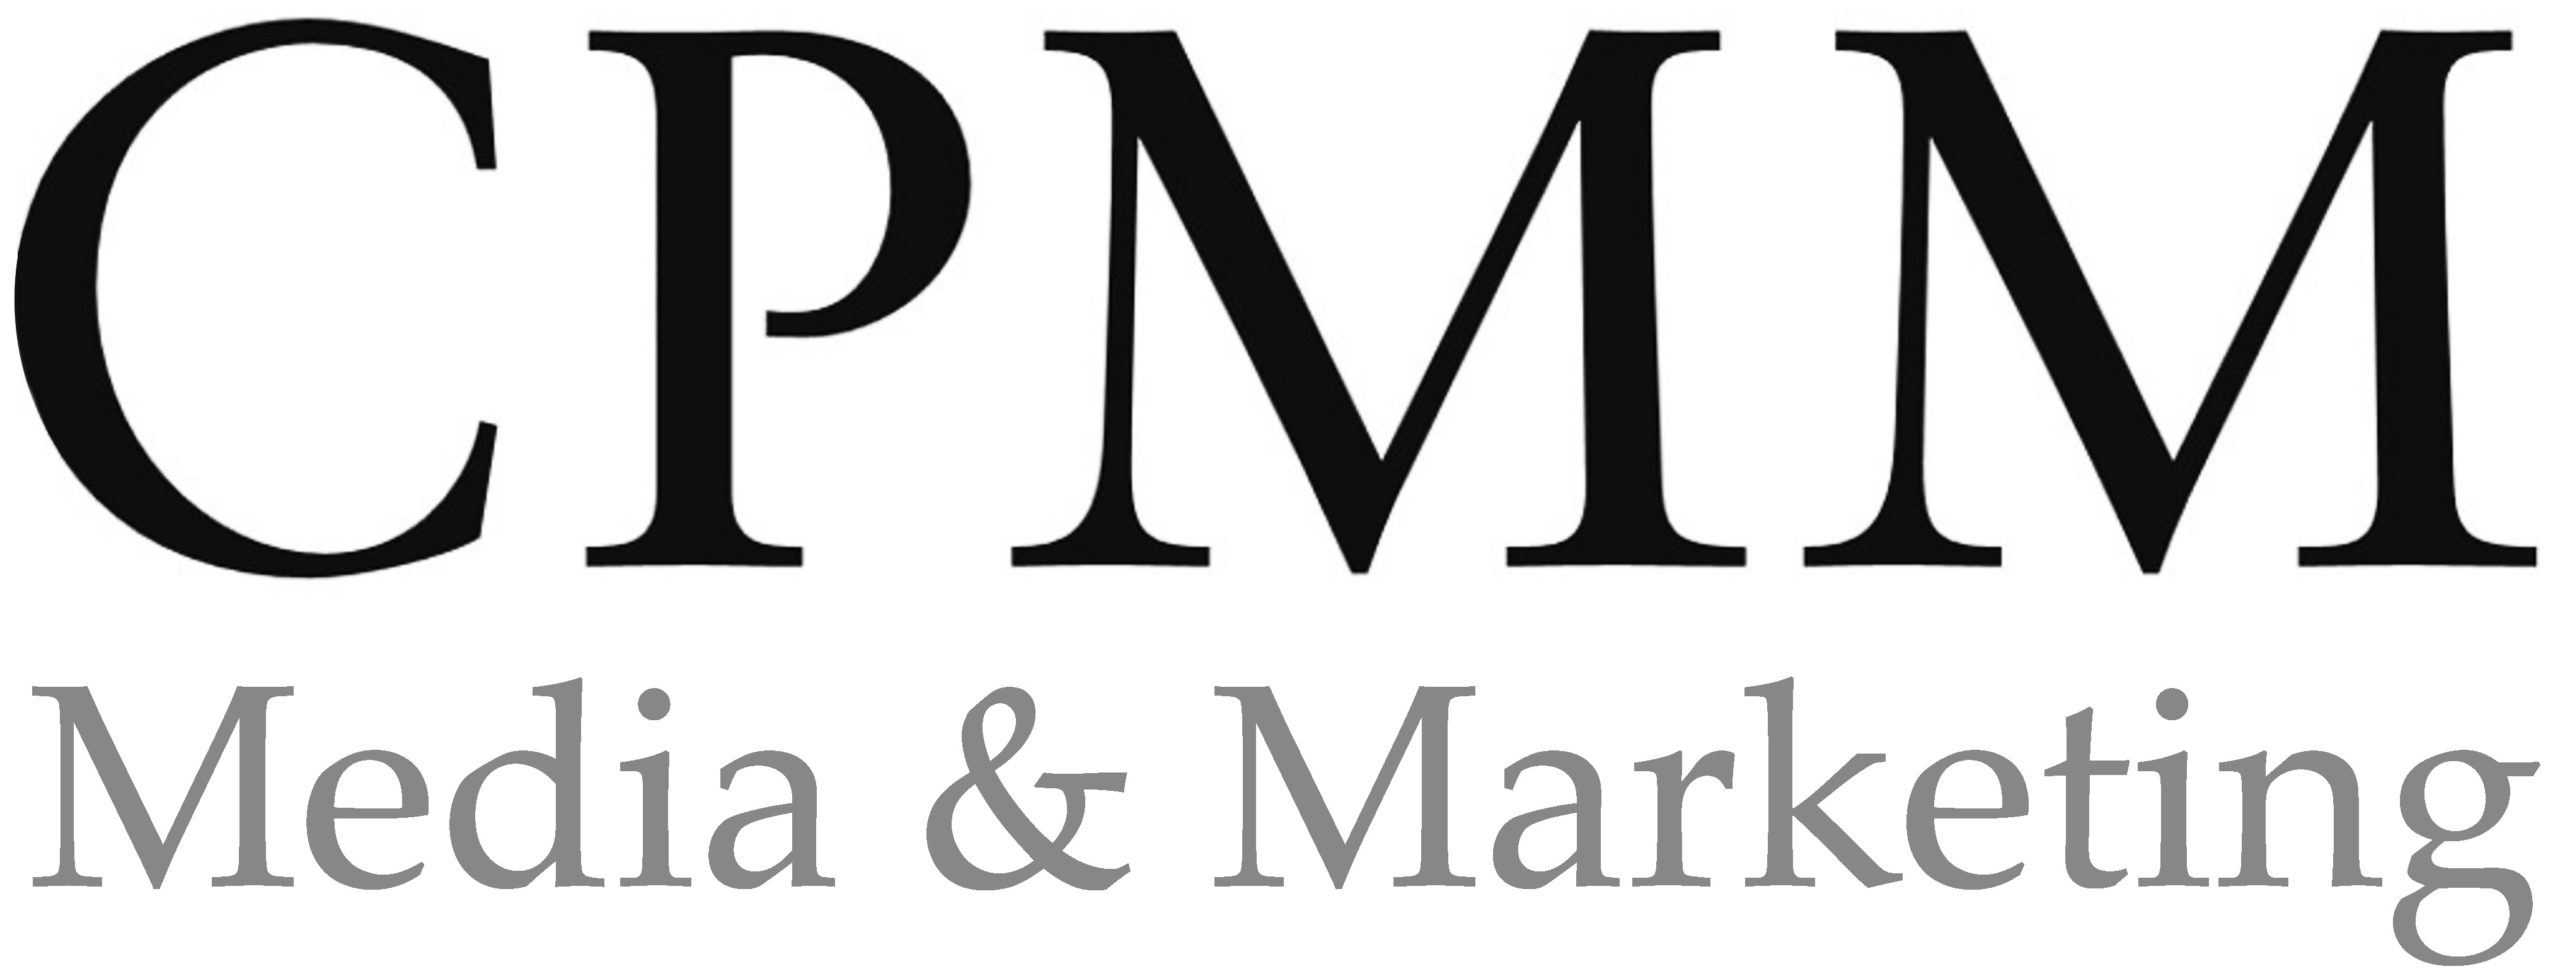 CPMM Media Group